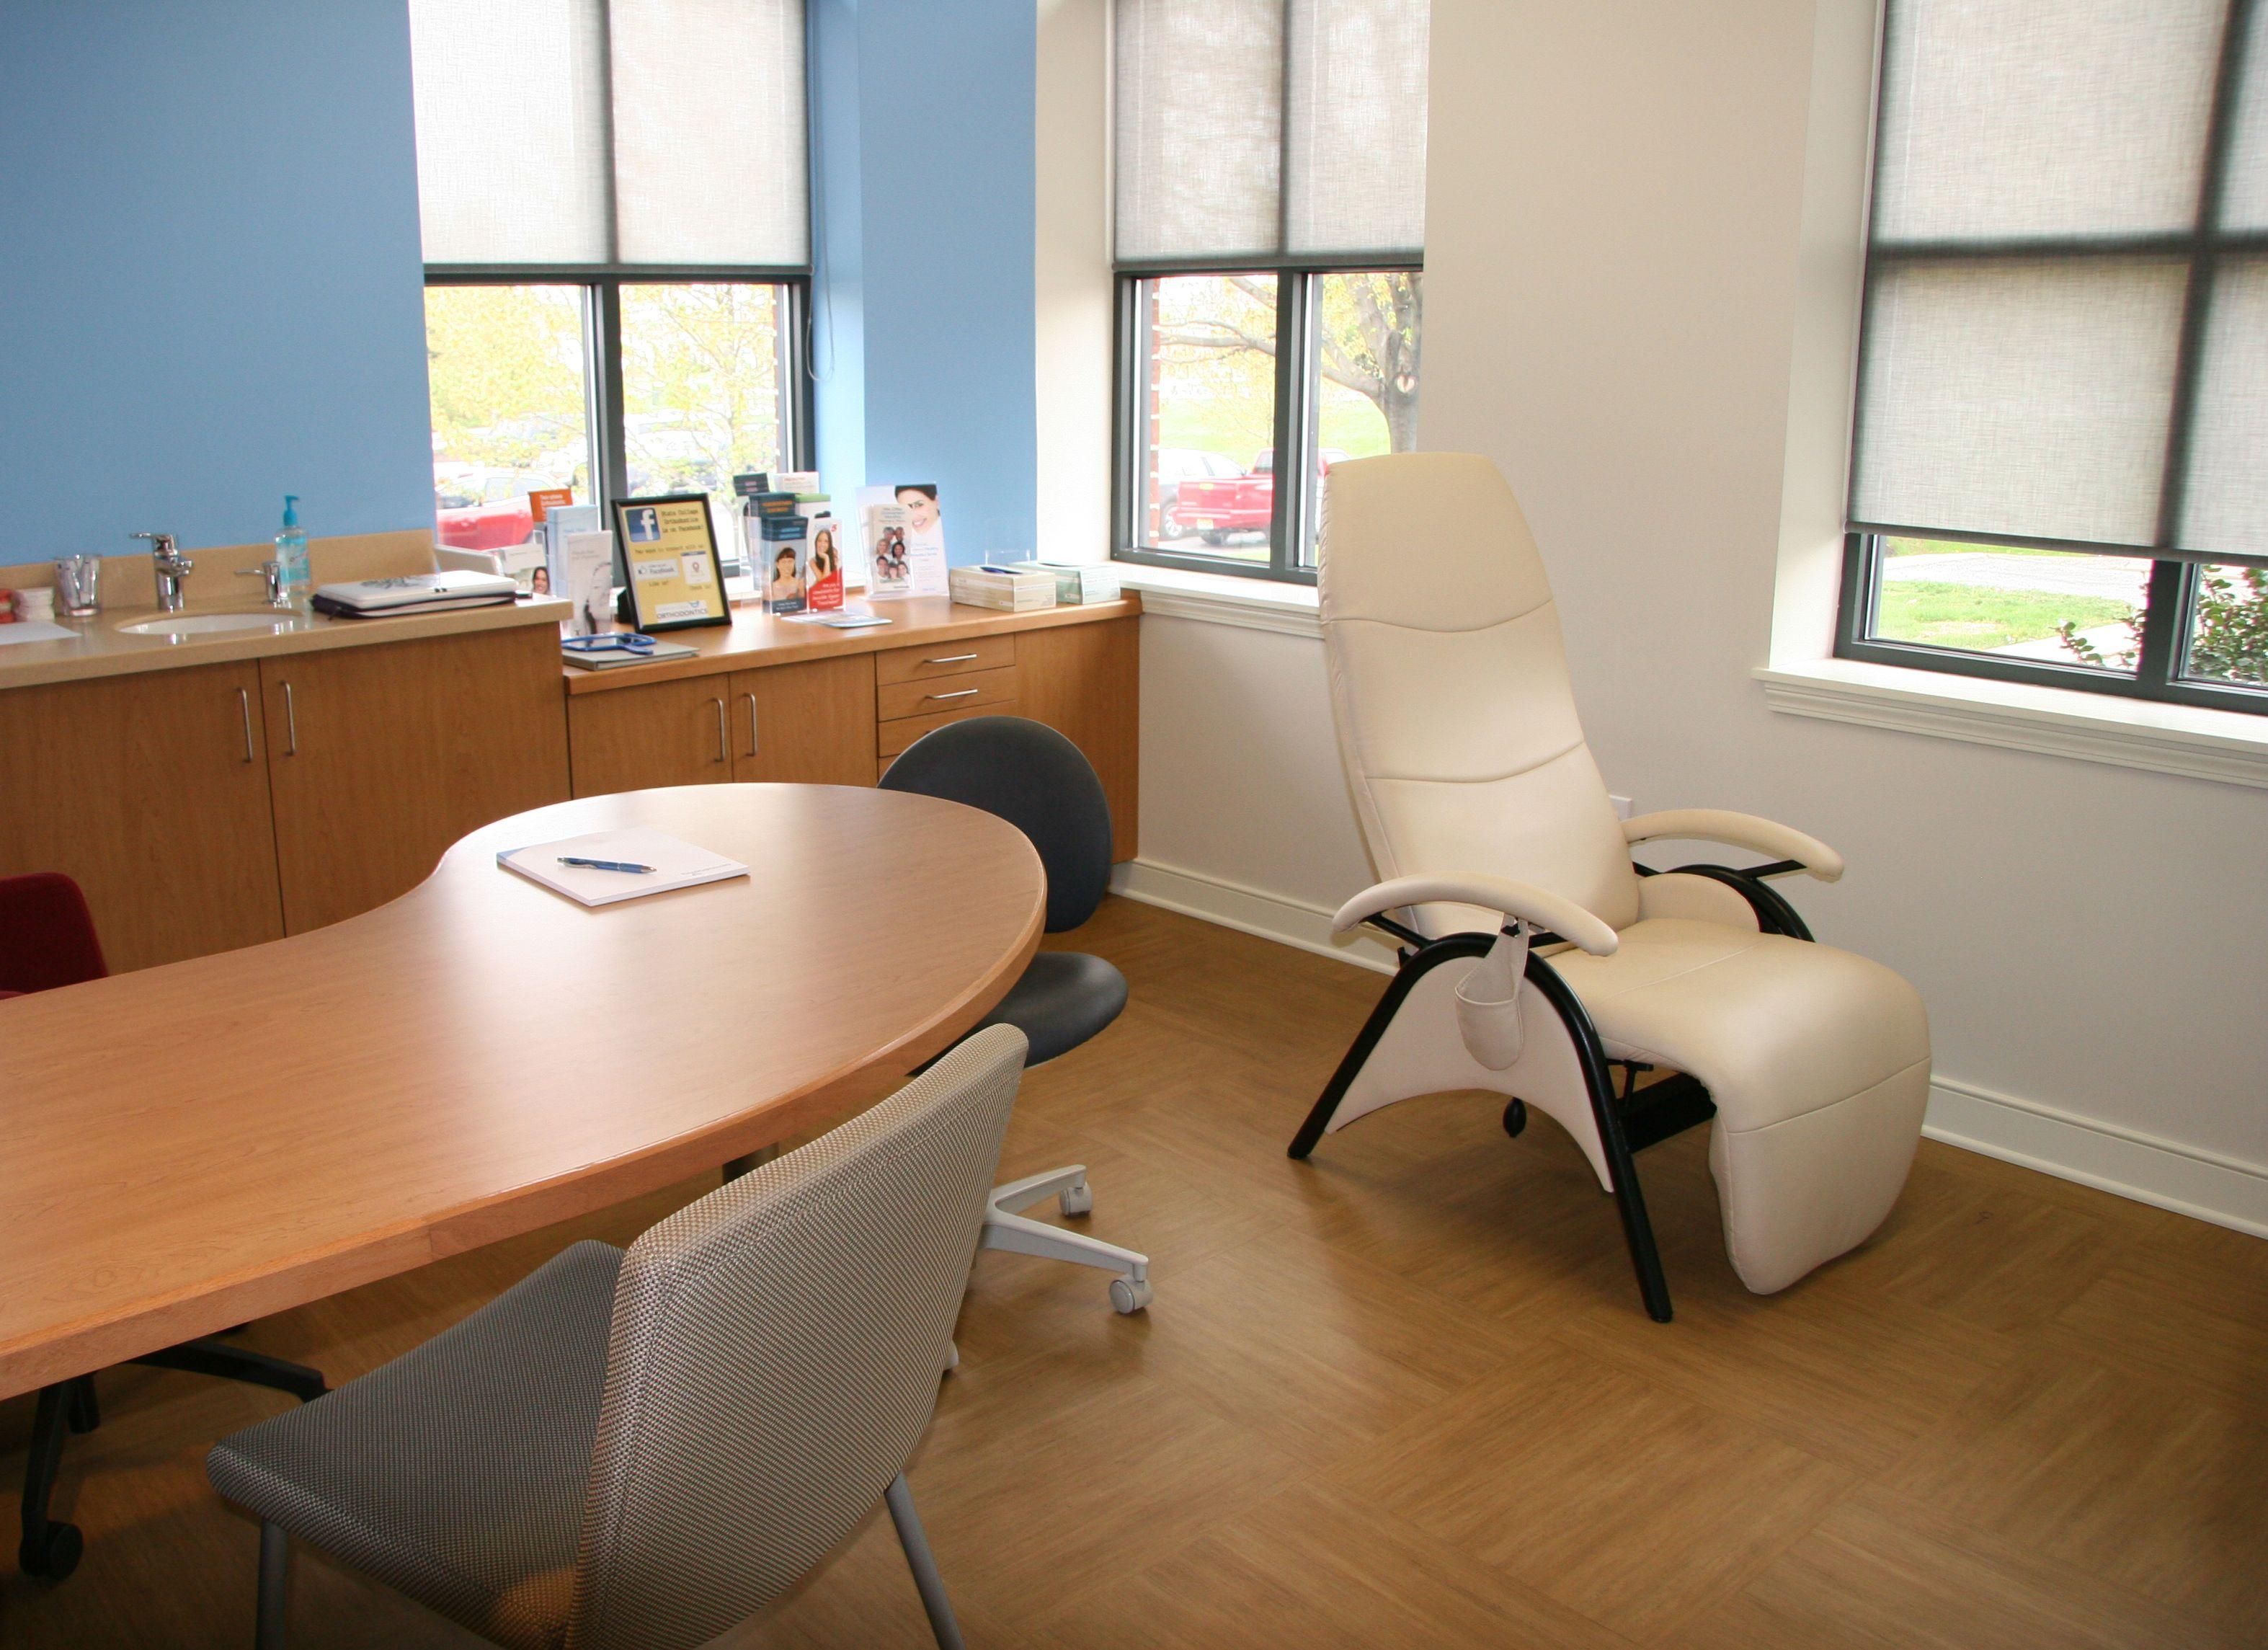 Zero gravity exam chair possible option vs traditional dental